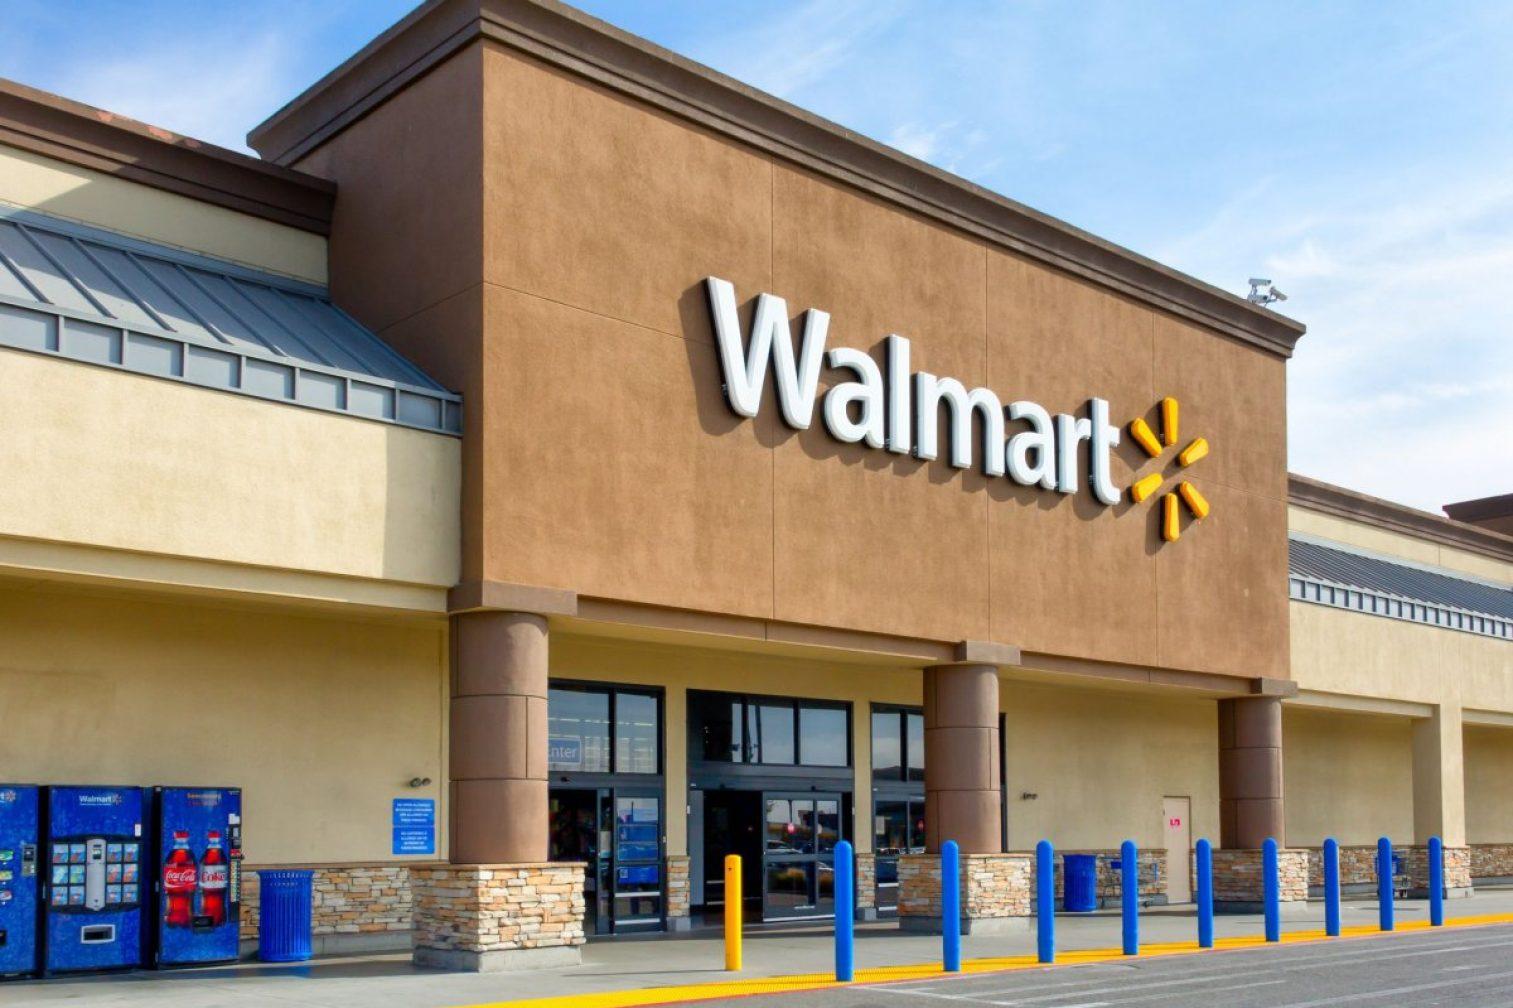 Walmart Store Exterior Royalty Free Image 1584370149